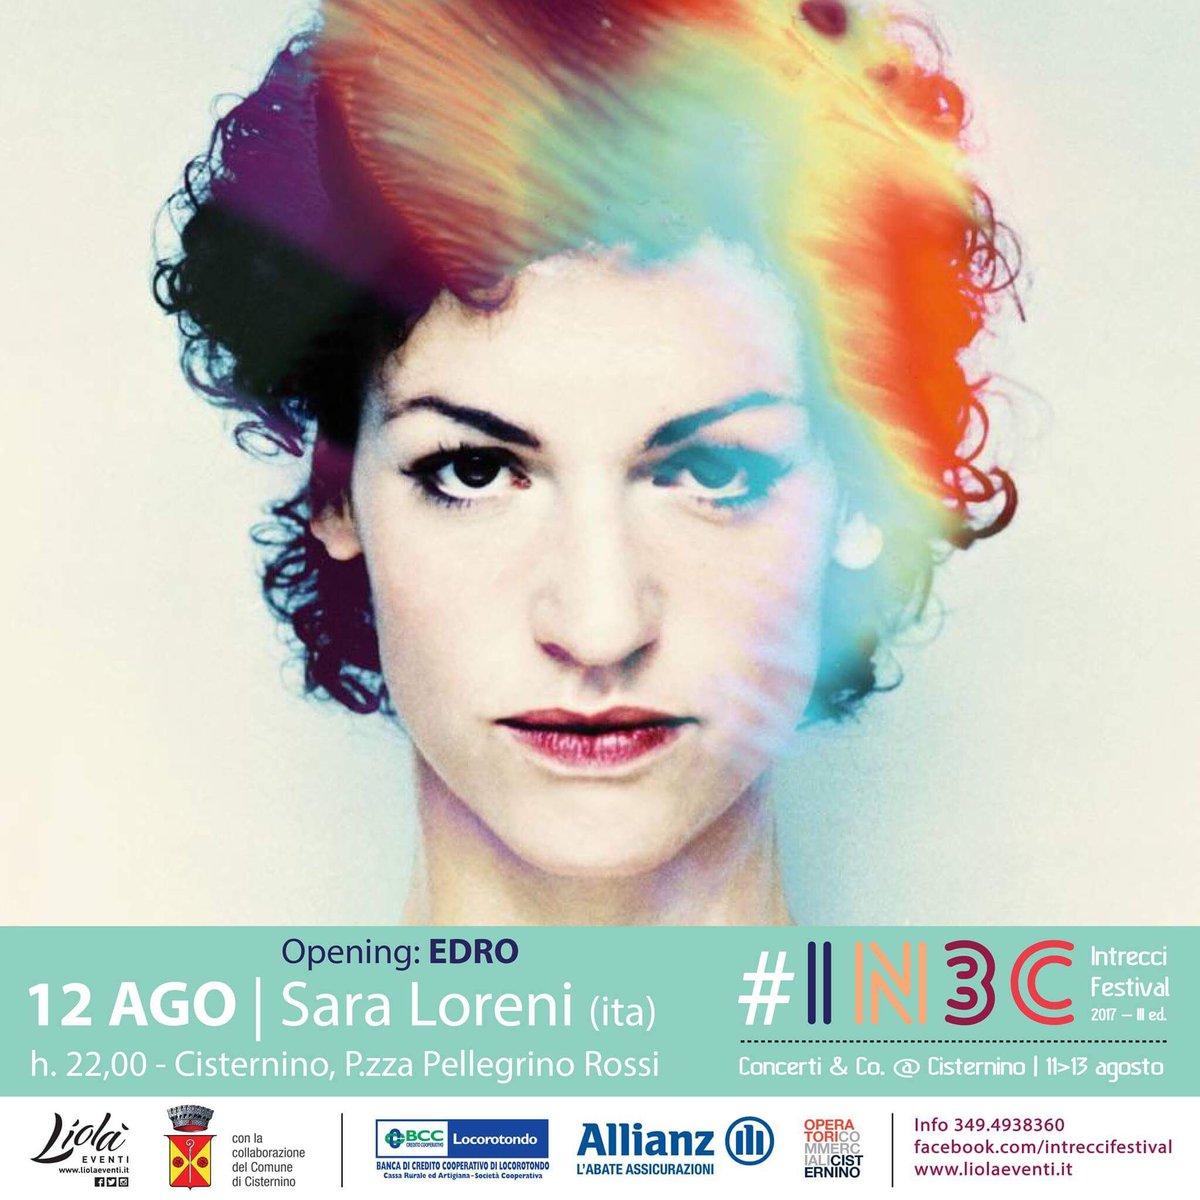 #IN3C #IntrecciFestival #12agosto #Cisternino #SaraLoreni #LiolaEventi #livemusic #valleditria #Puglia https://t.co/2uBrlp8mKS